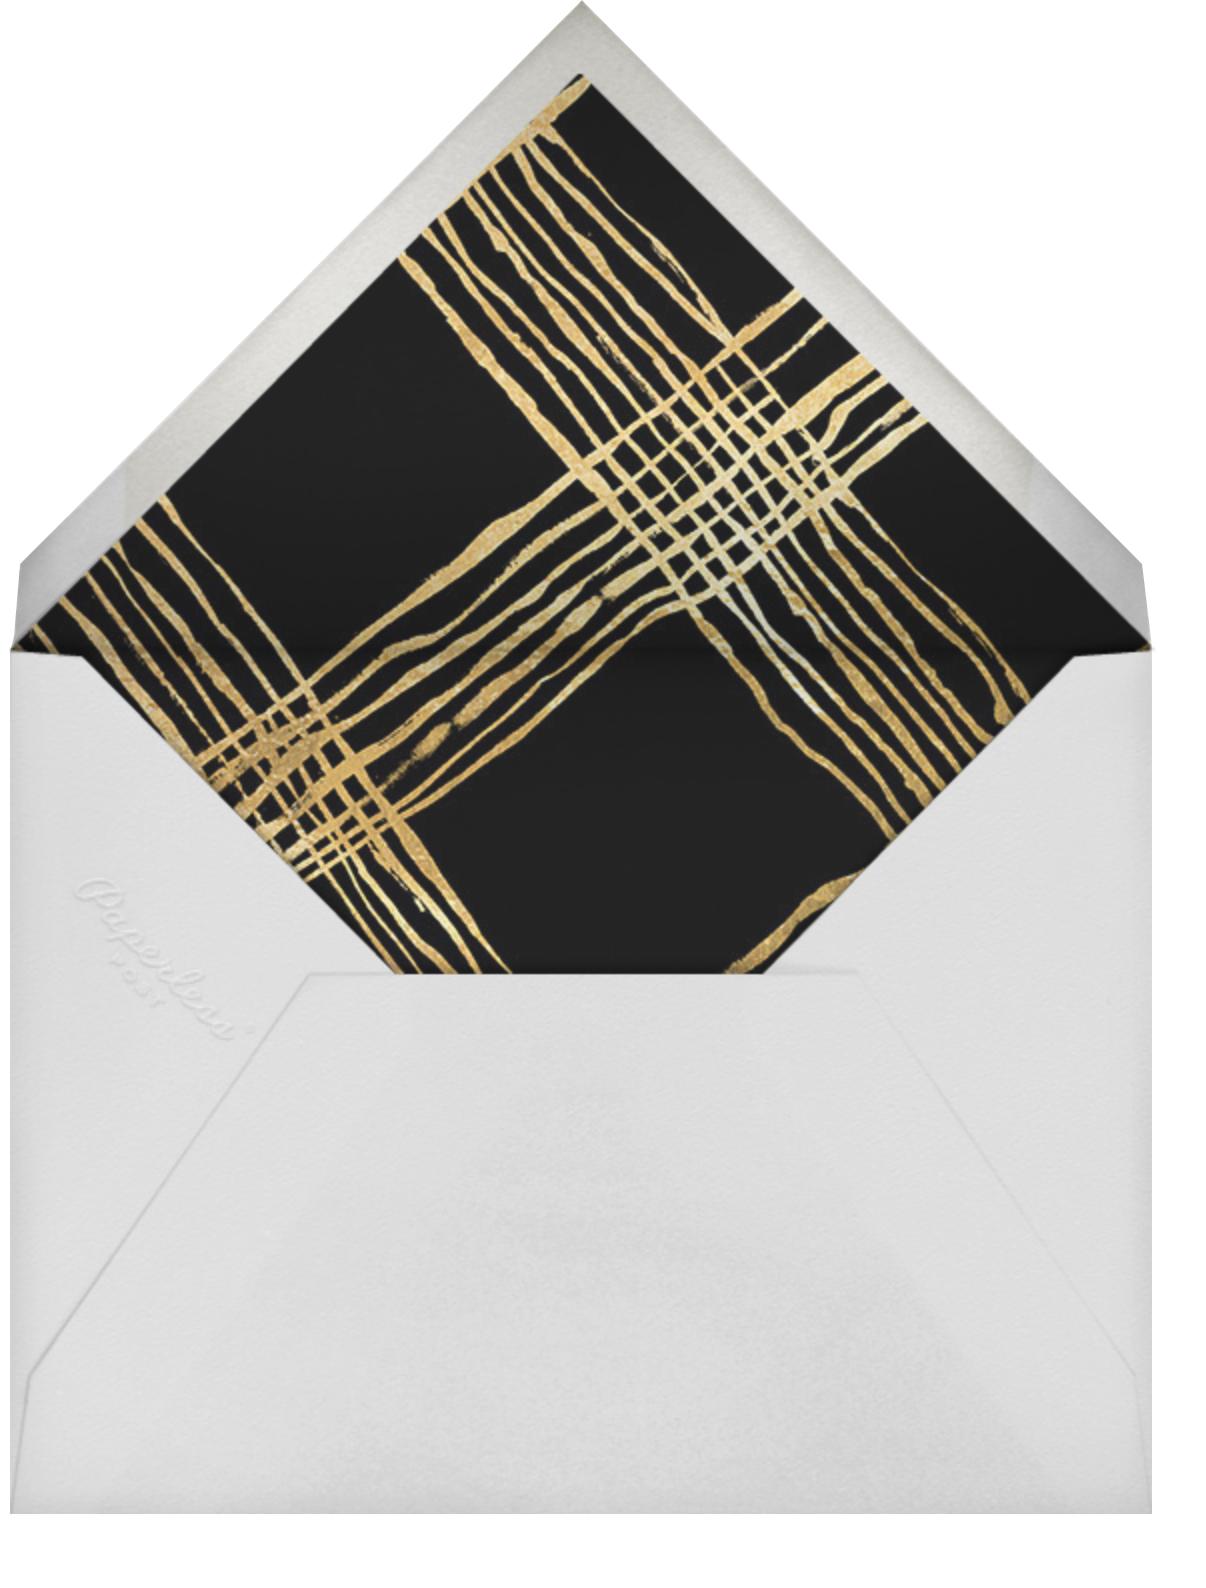 Juxtapose - Kelly Wearstler - Anniversary party - envelope back